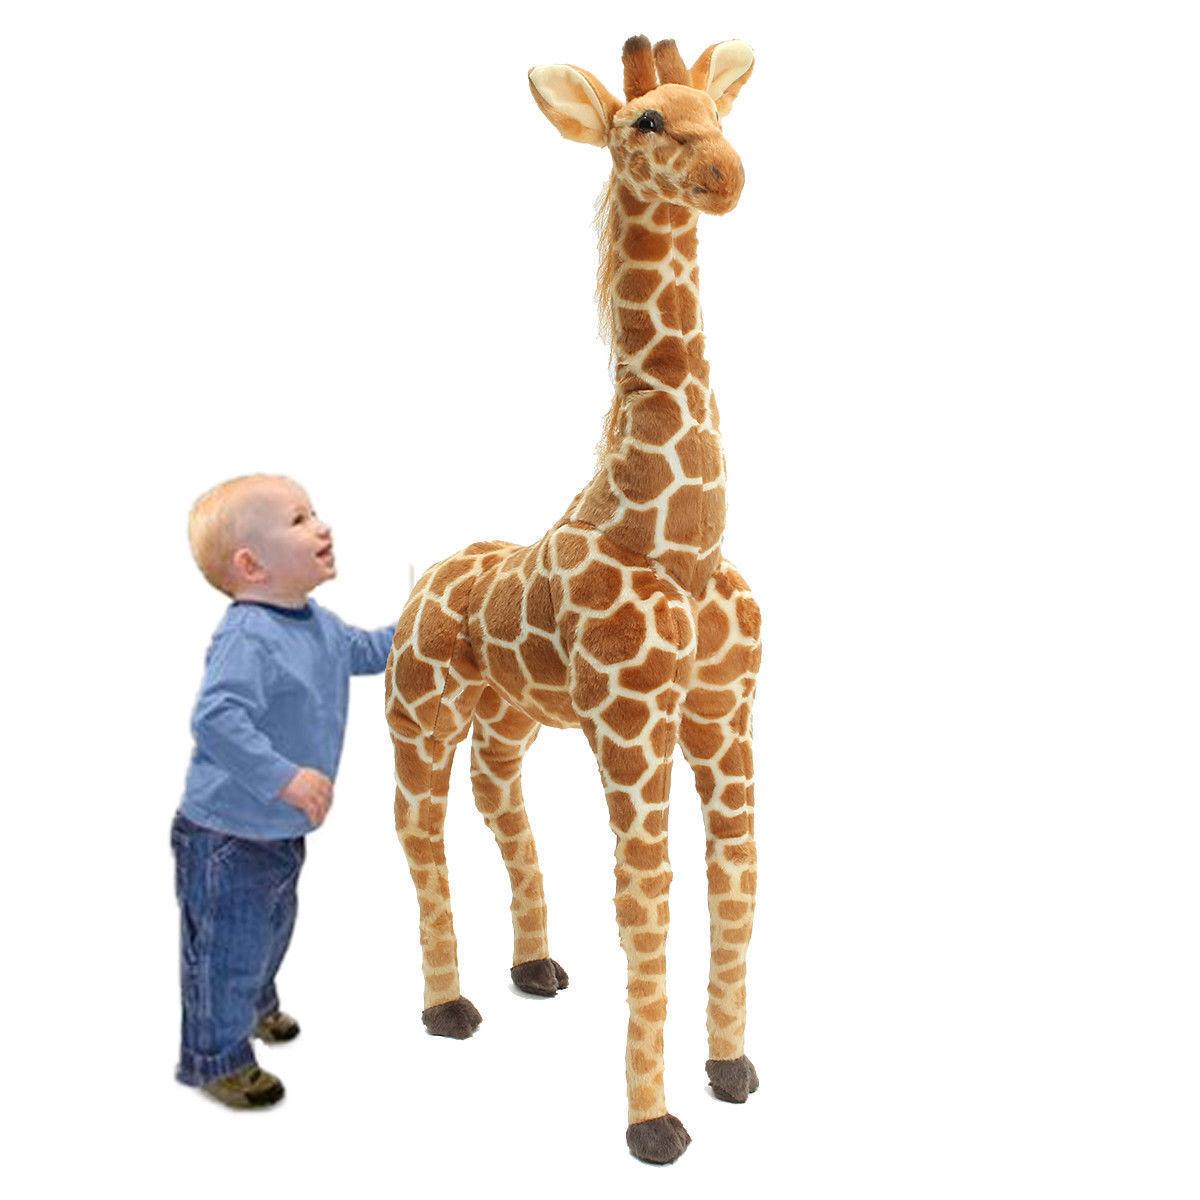 2019 2019 2019 Plush Giraffe Toy Doll Giant Large Stuffed Animals Soft Doll kids Gift f1ecee